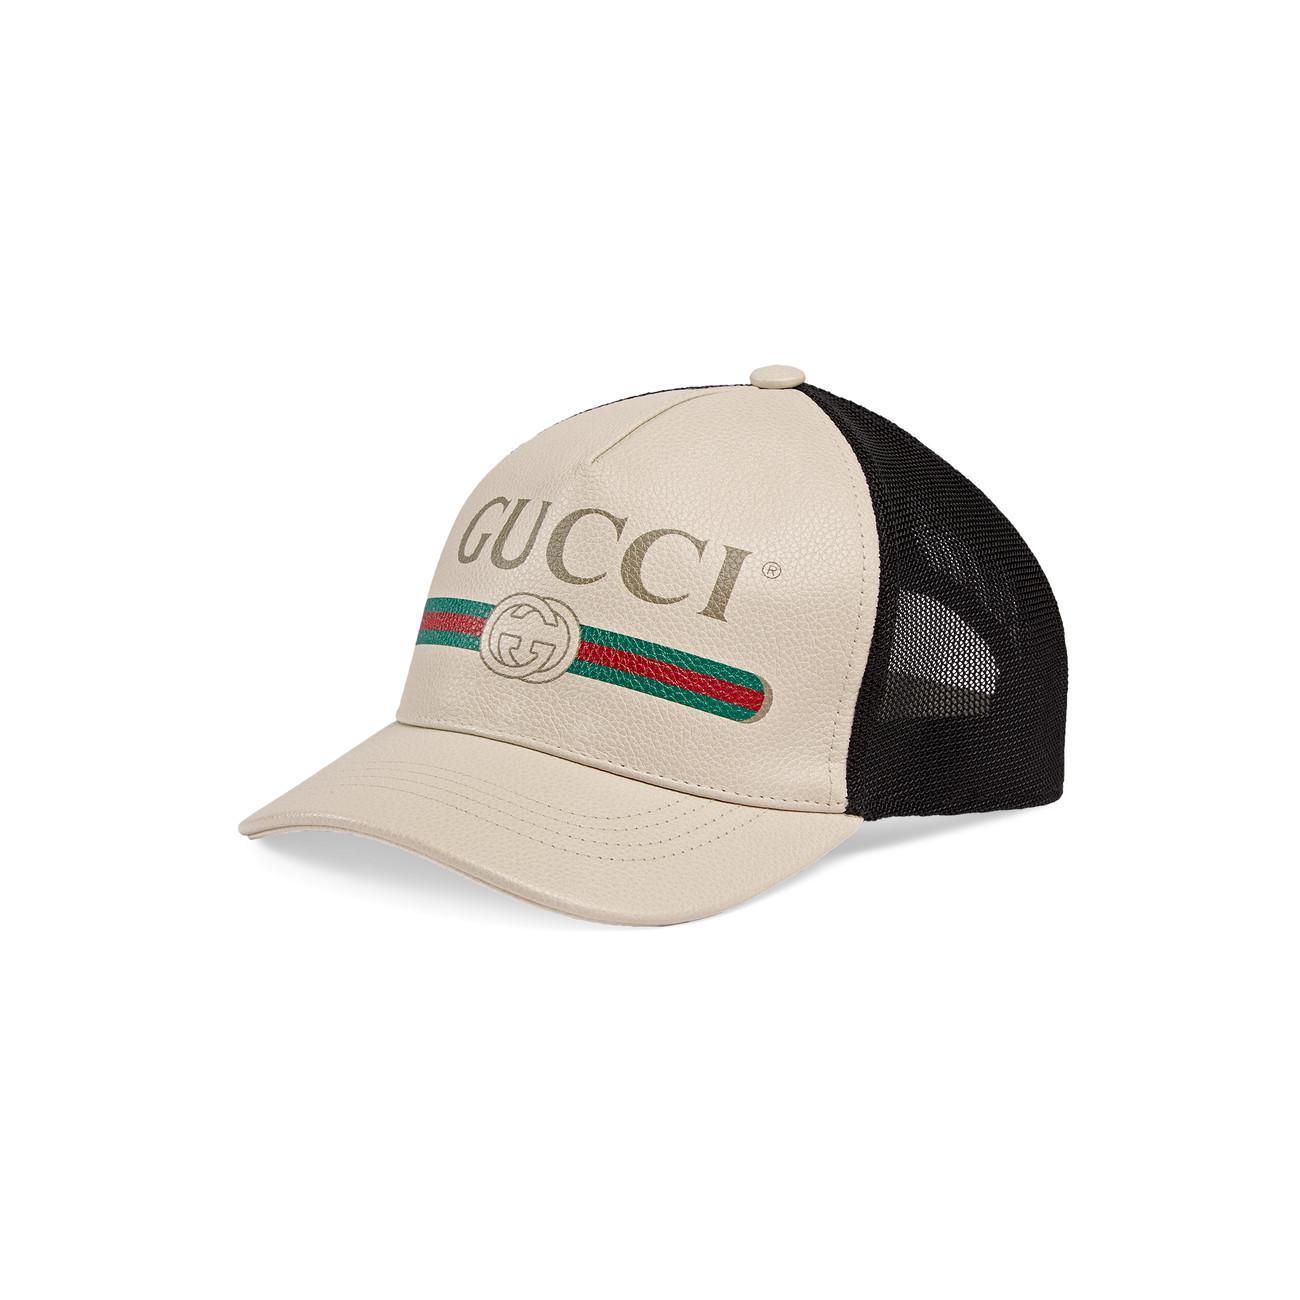 a480d69f5e Women's White Print Leather Baseball Hat